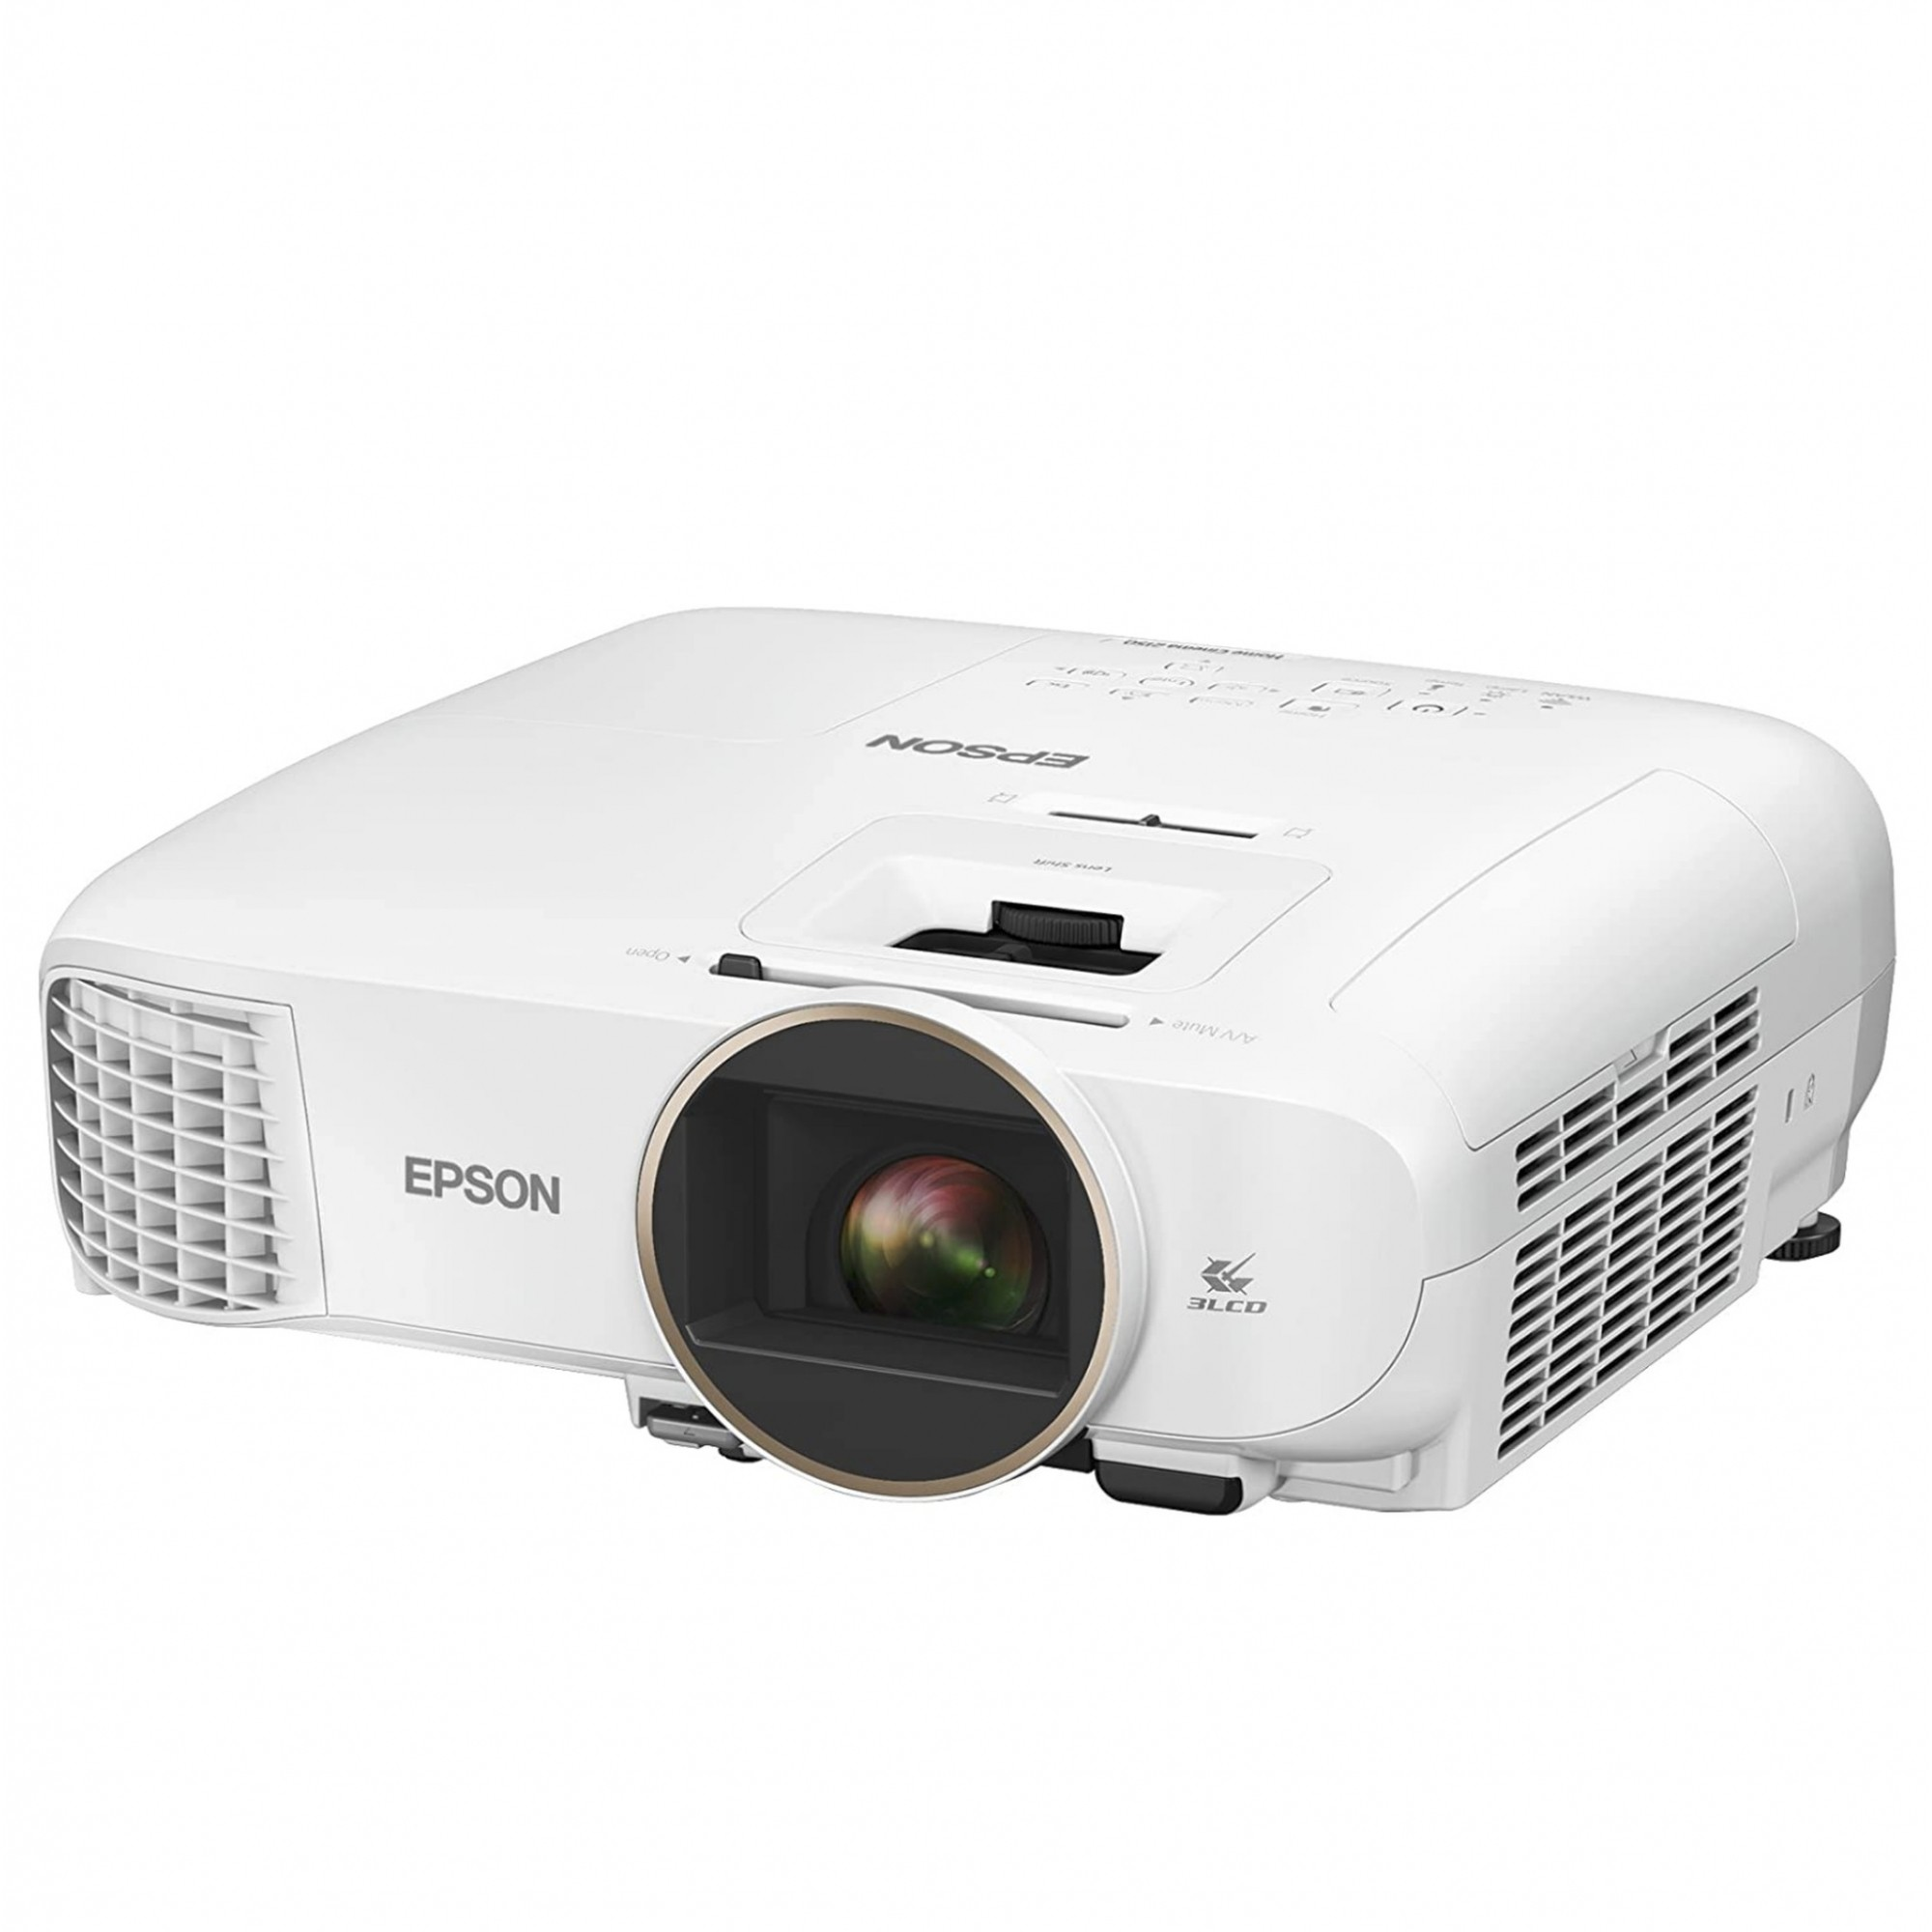 Epson 2150 Powerlite Home Cinema Projetor Full Hd